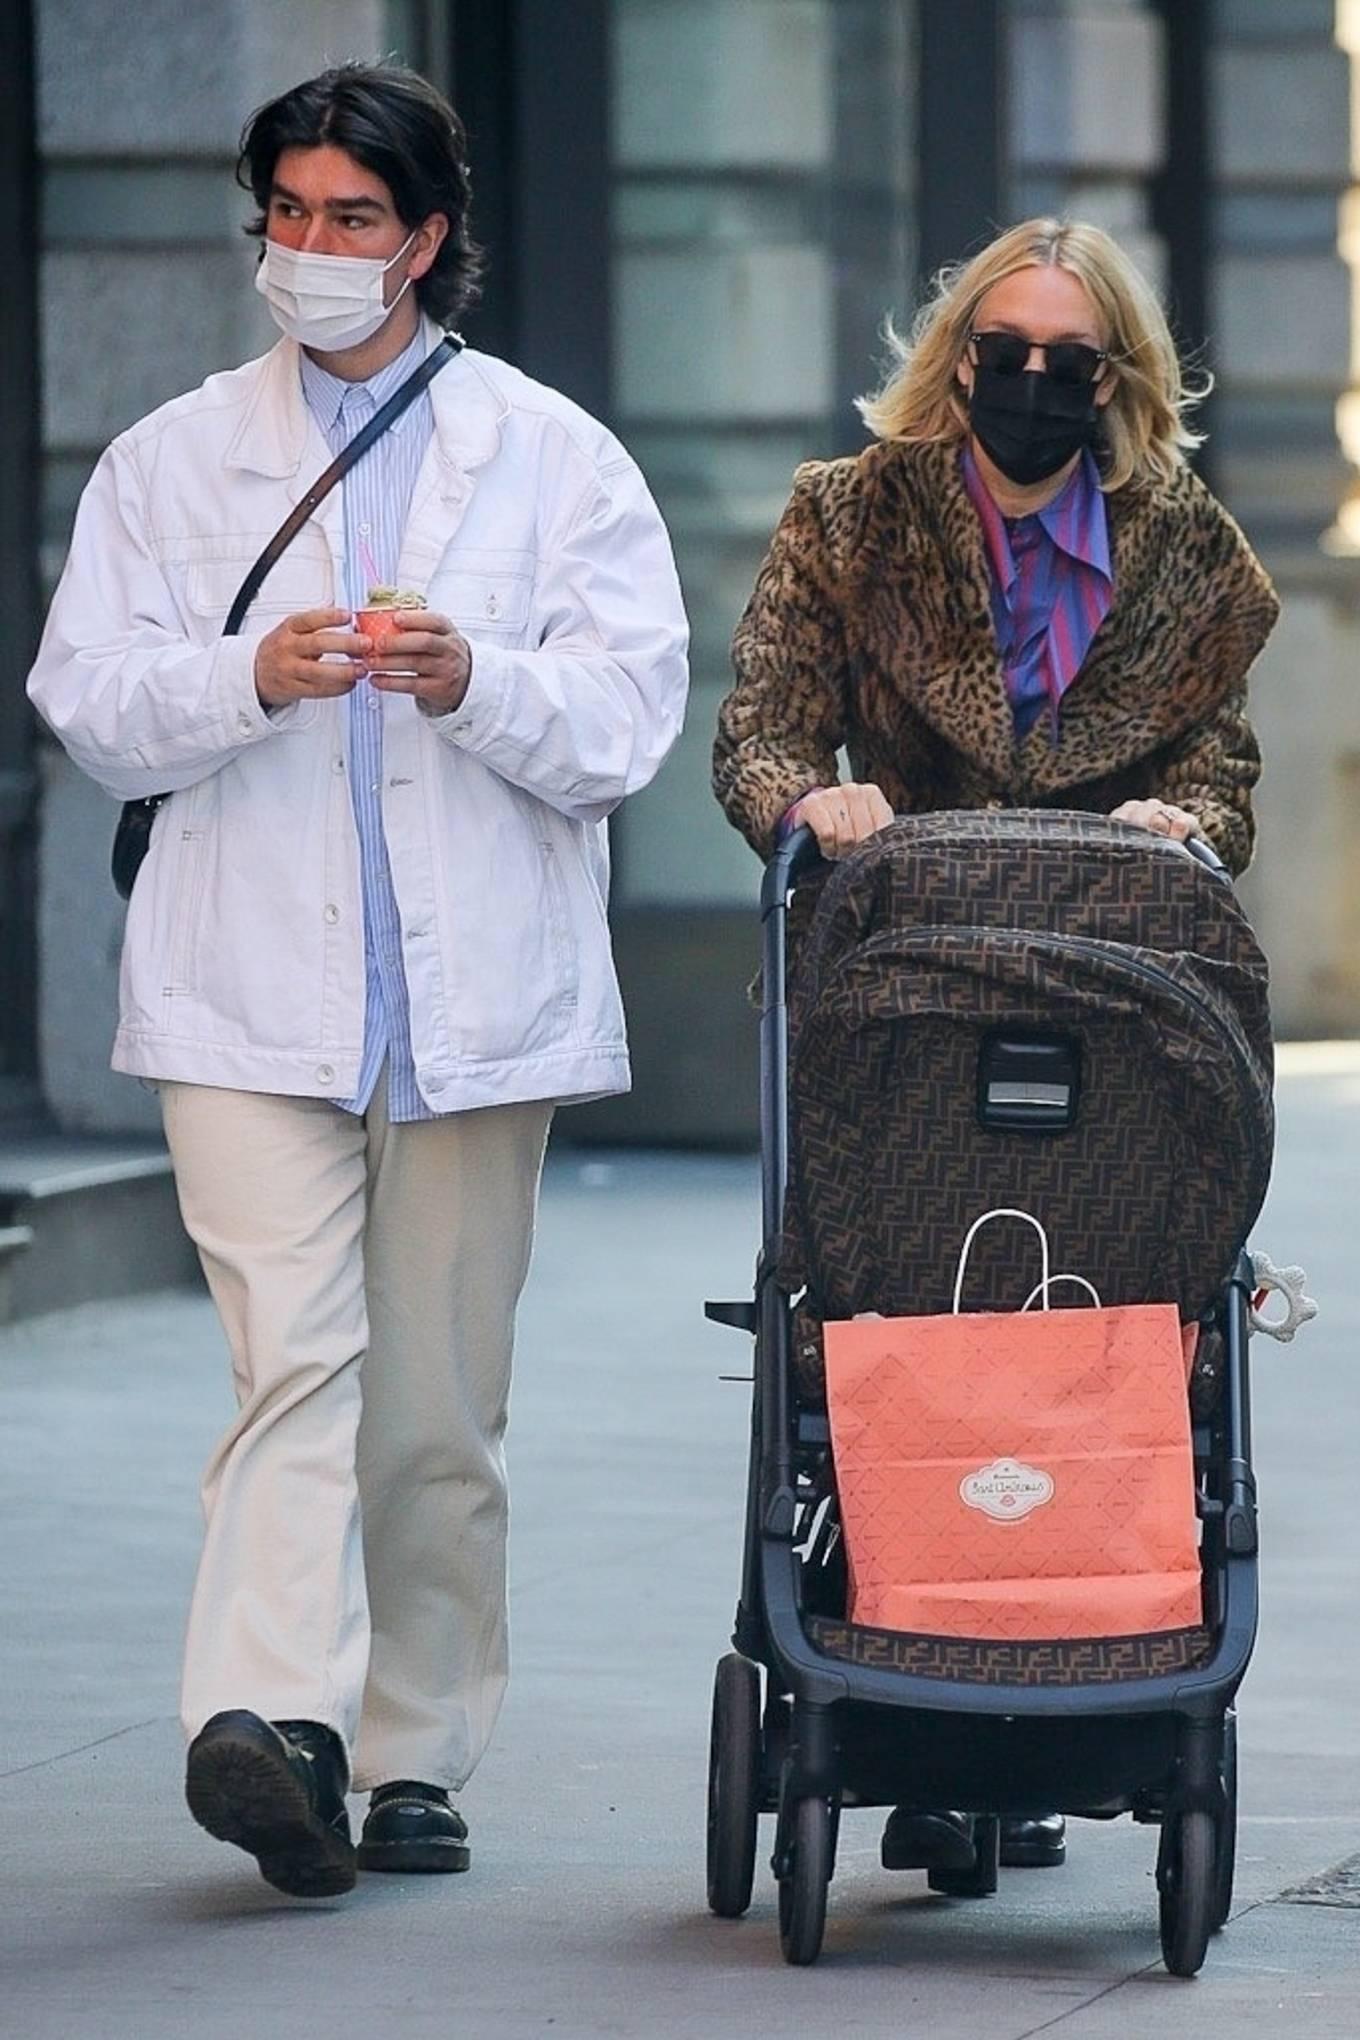 Chloe Sevigny 2021 : Chloe Sevigny – With husband Sinisa Mackovic strolling with their baby in New York-03